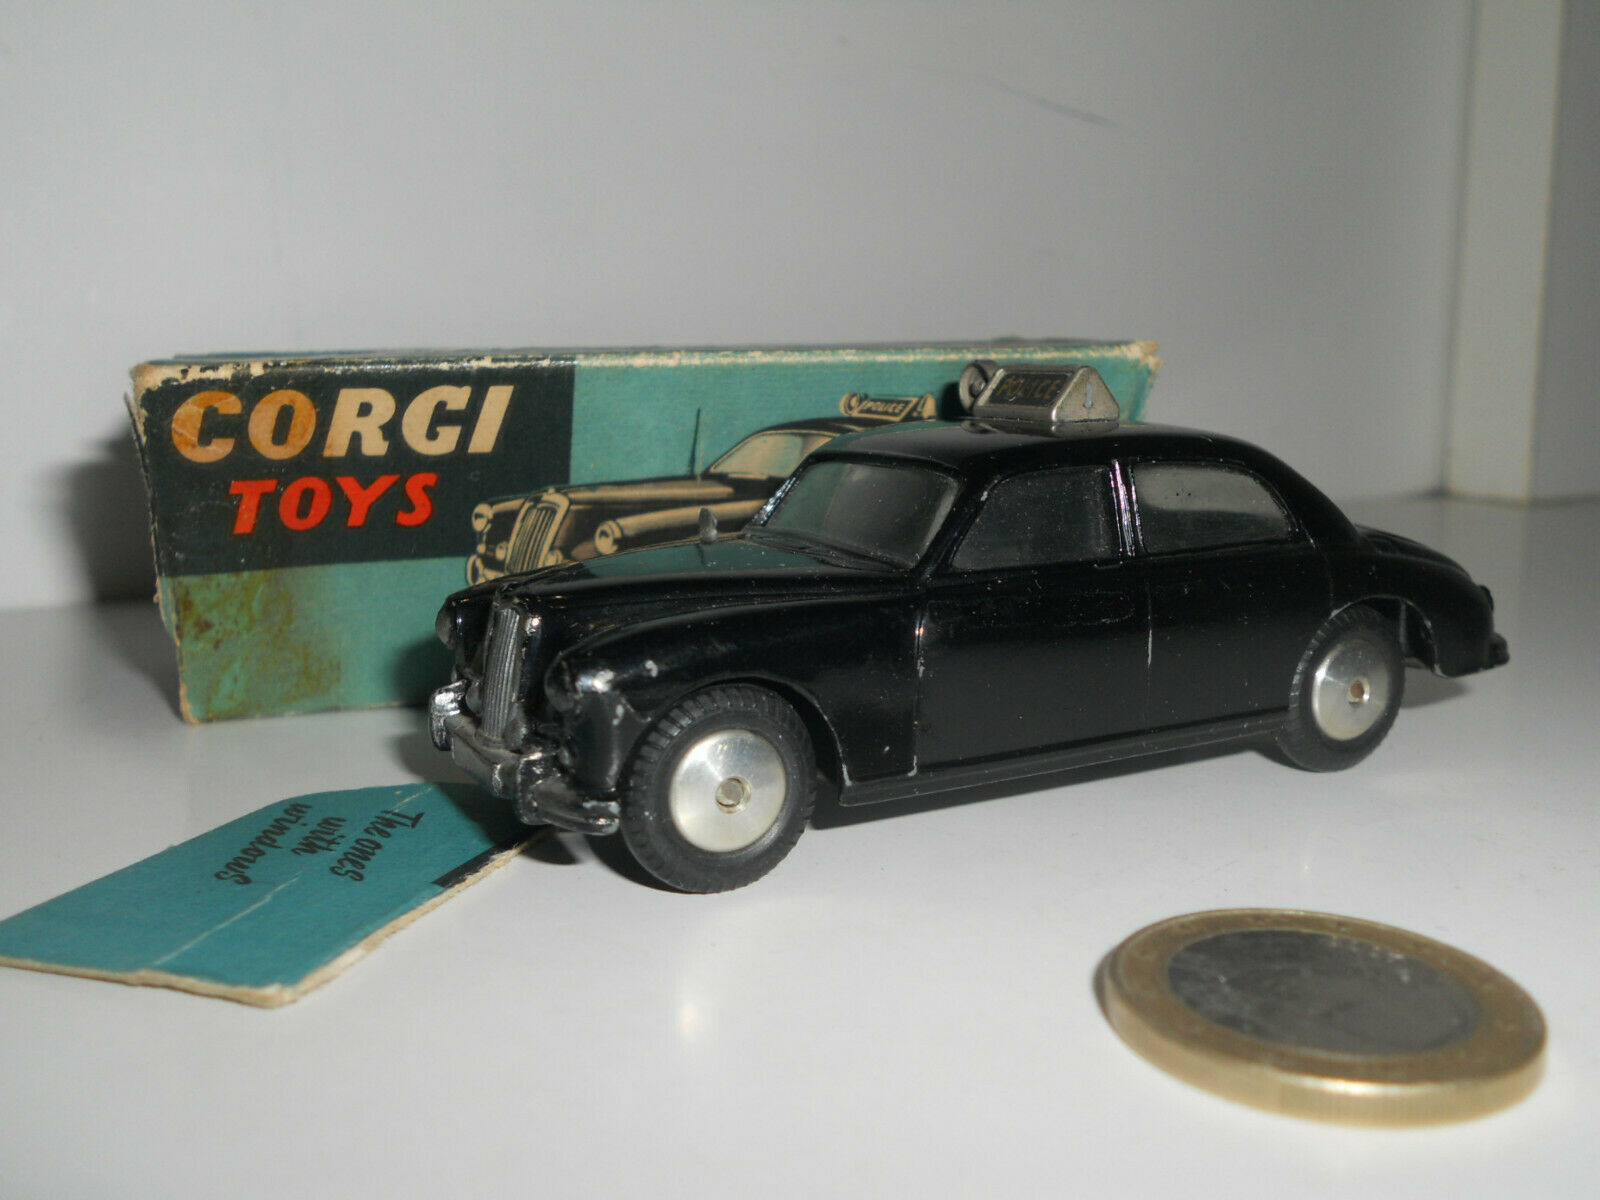 CORGI TOYS RILEY PATHFINDER POLICE CAR N° 209 853018